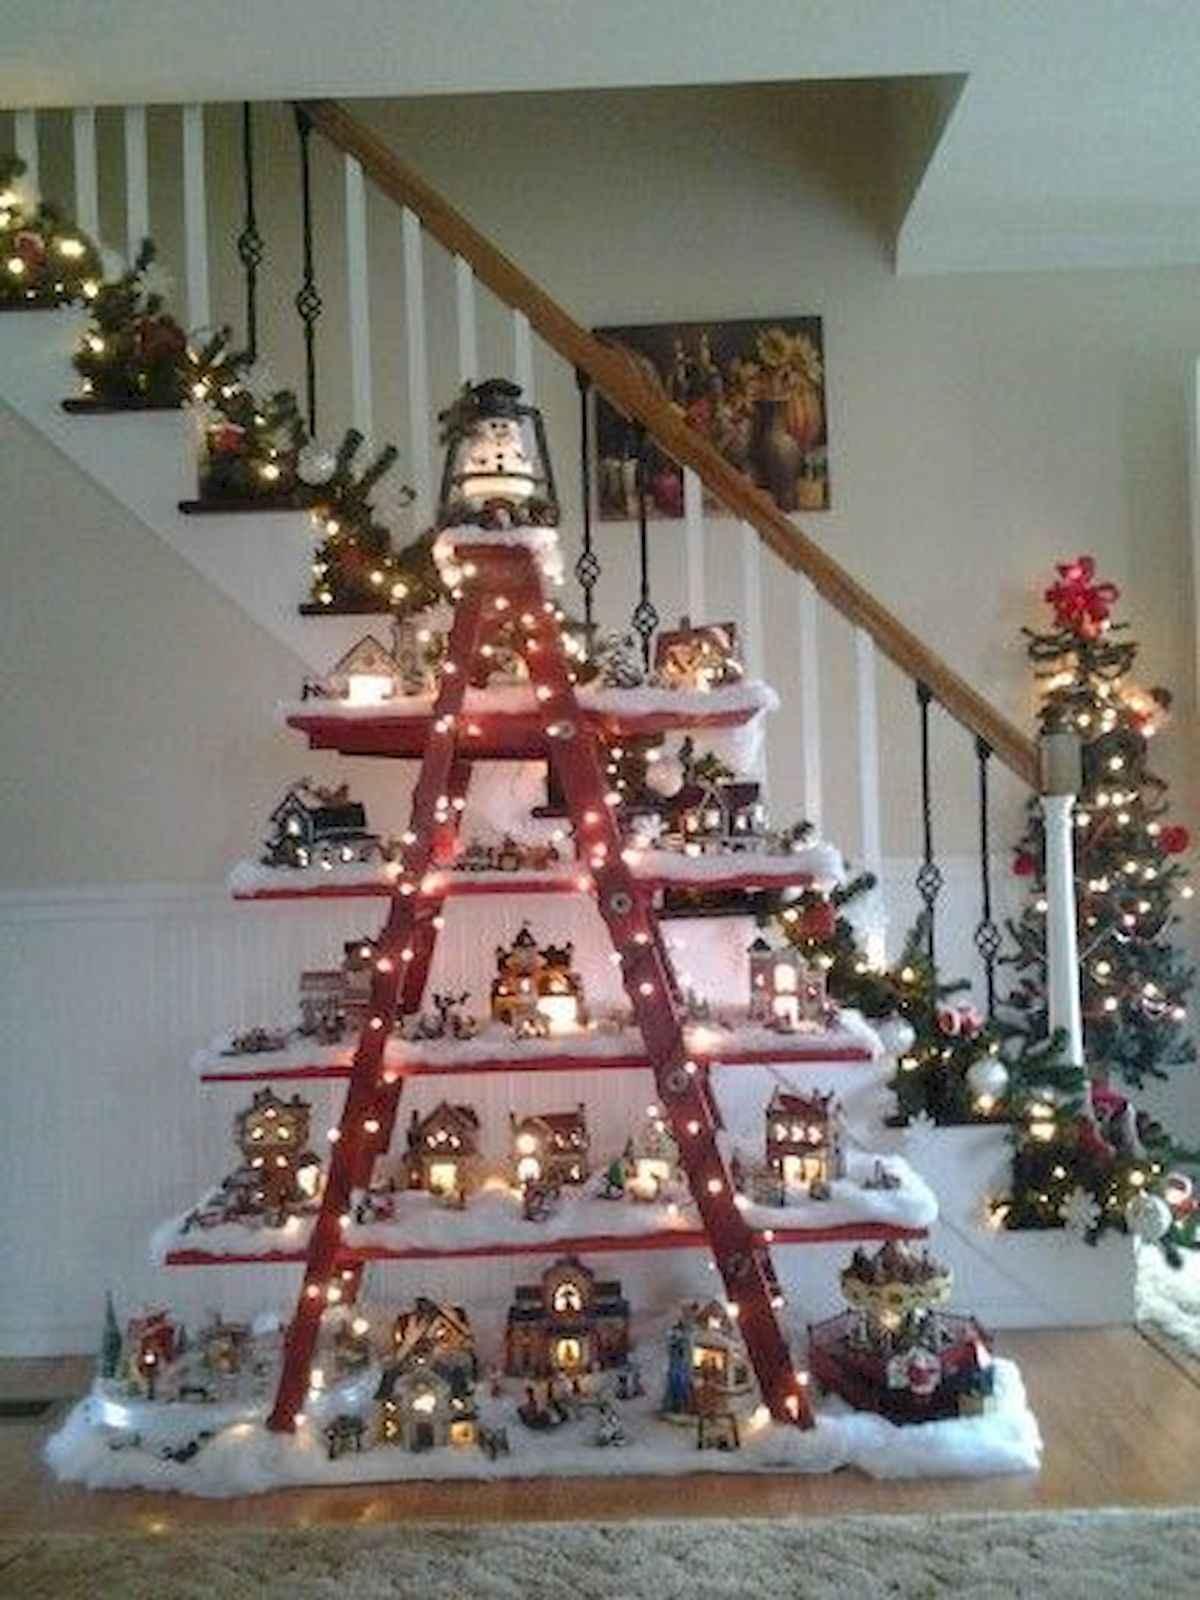 40 unique christmas tree ideas decorations (14)